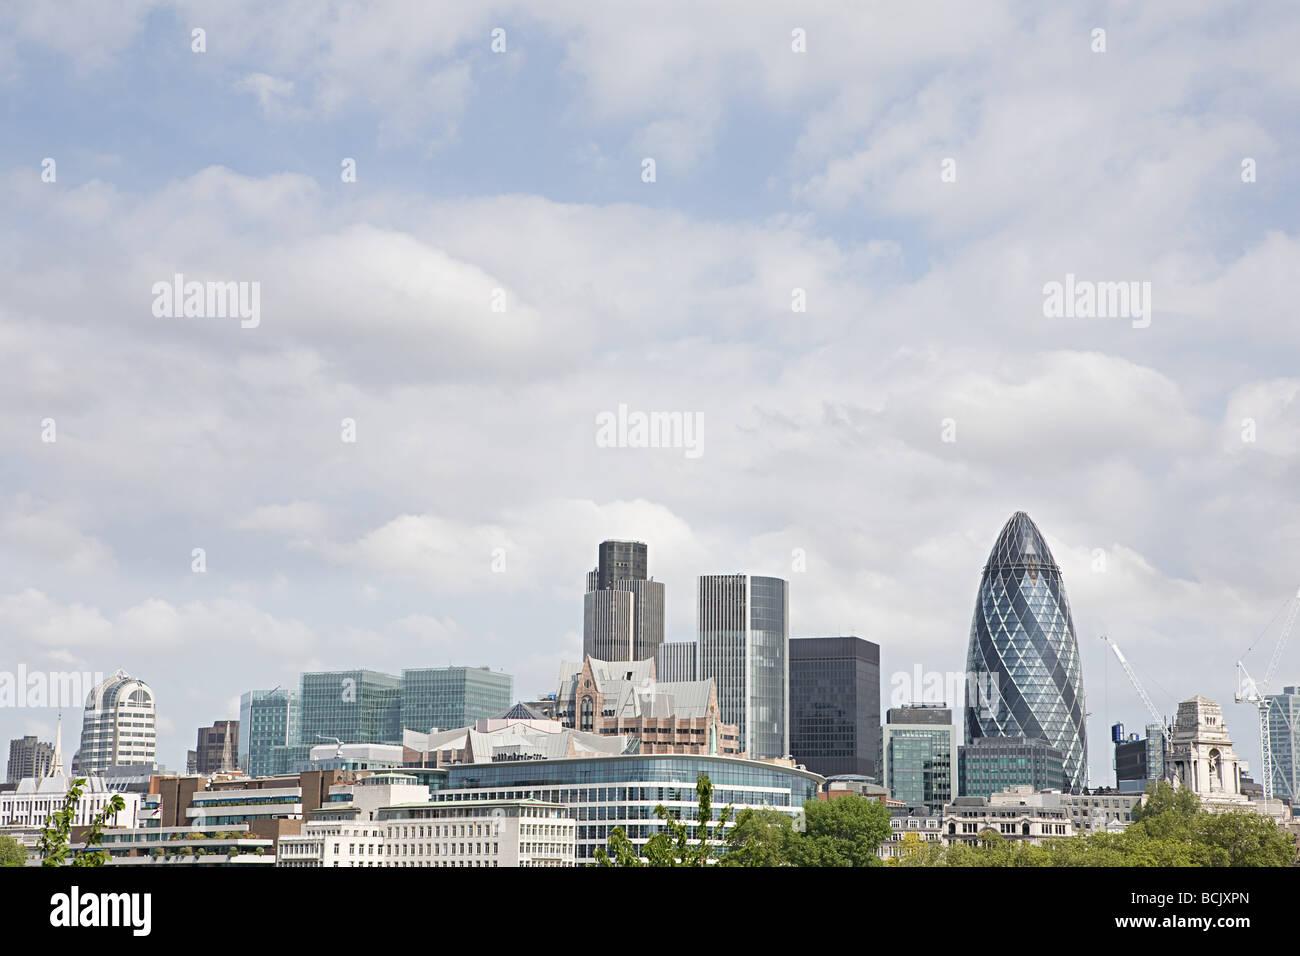 City of london skyline - Stock Image